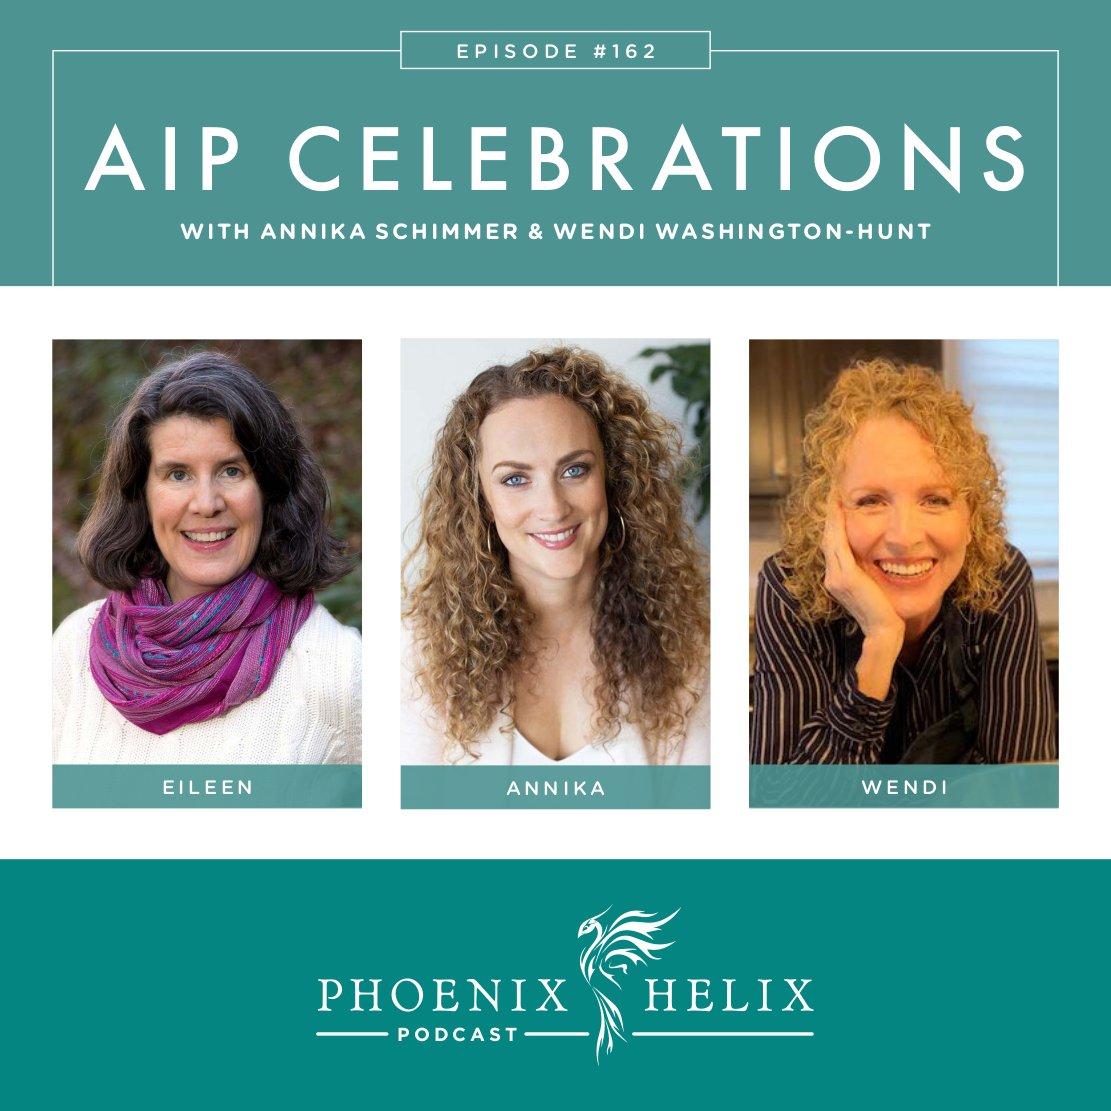 AIP Celebrations | Phoenix Helix Podcast